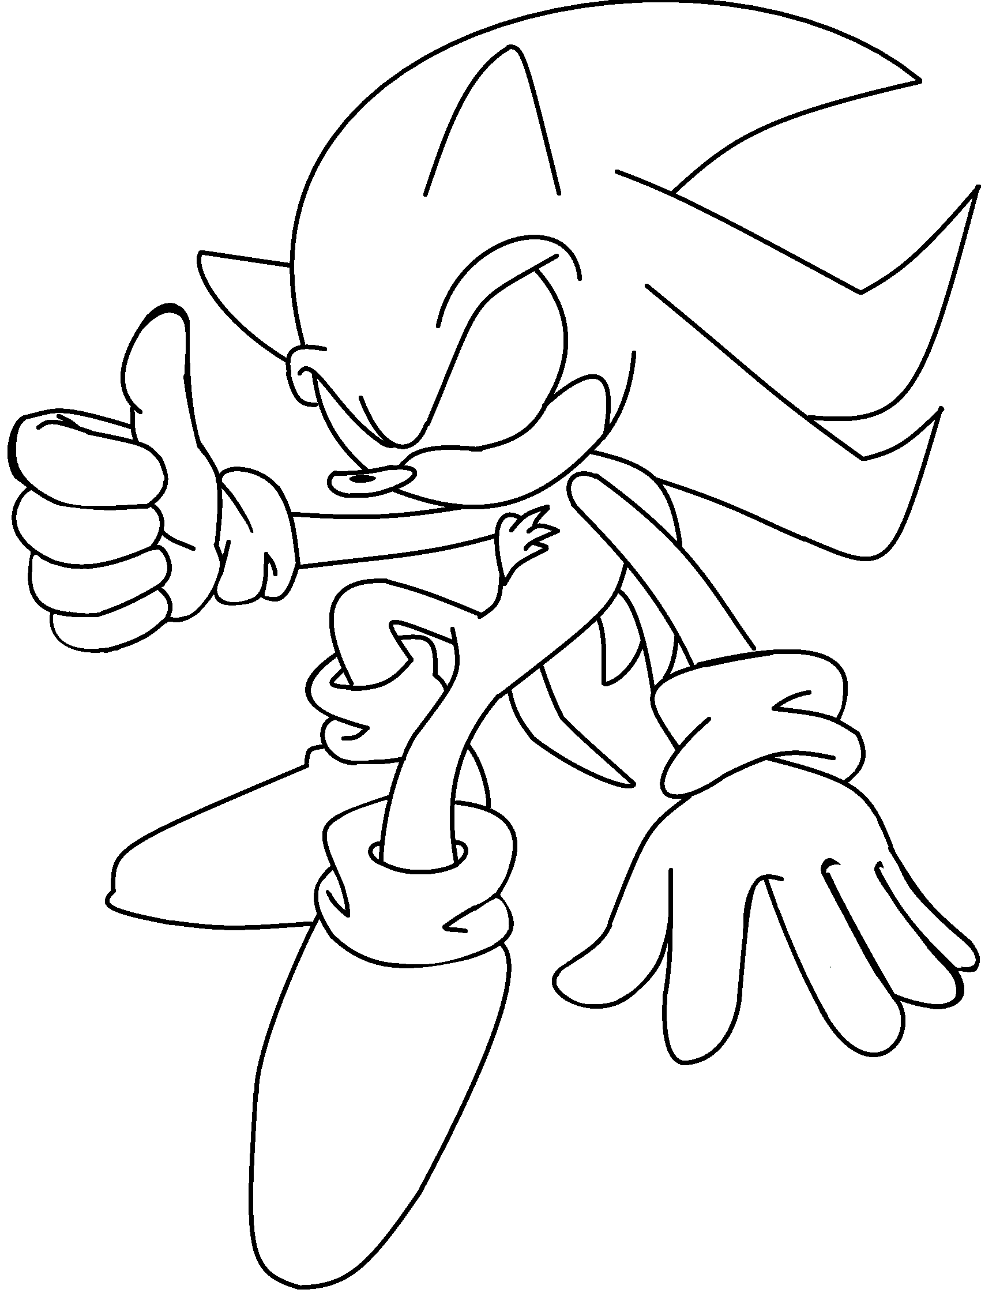 Dark Sonic The Hedgehog Coloring Pages - PeepsBurgh